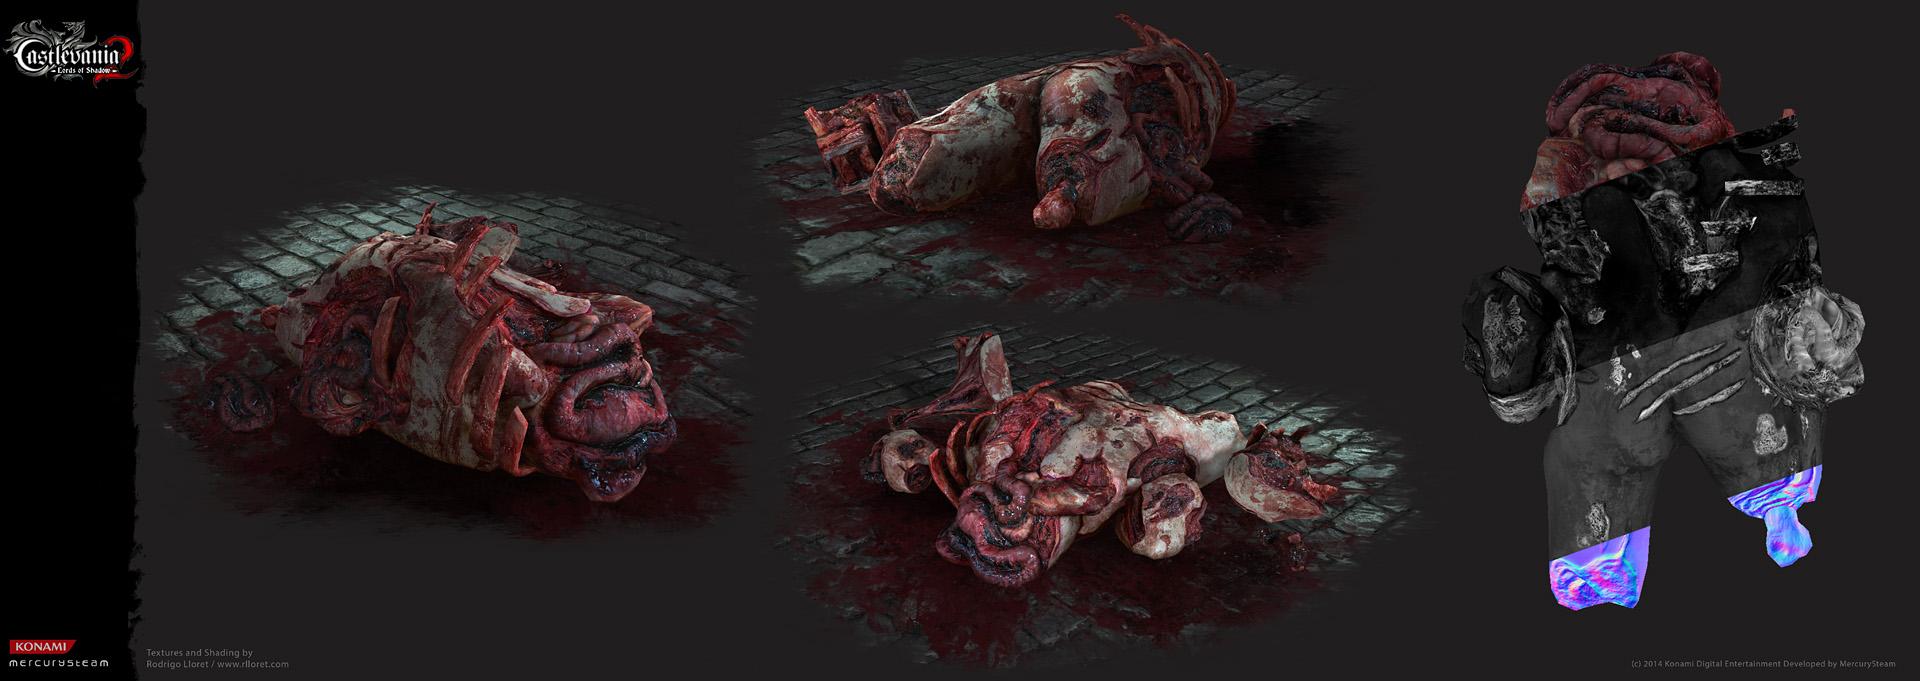 corpse.jpg